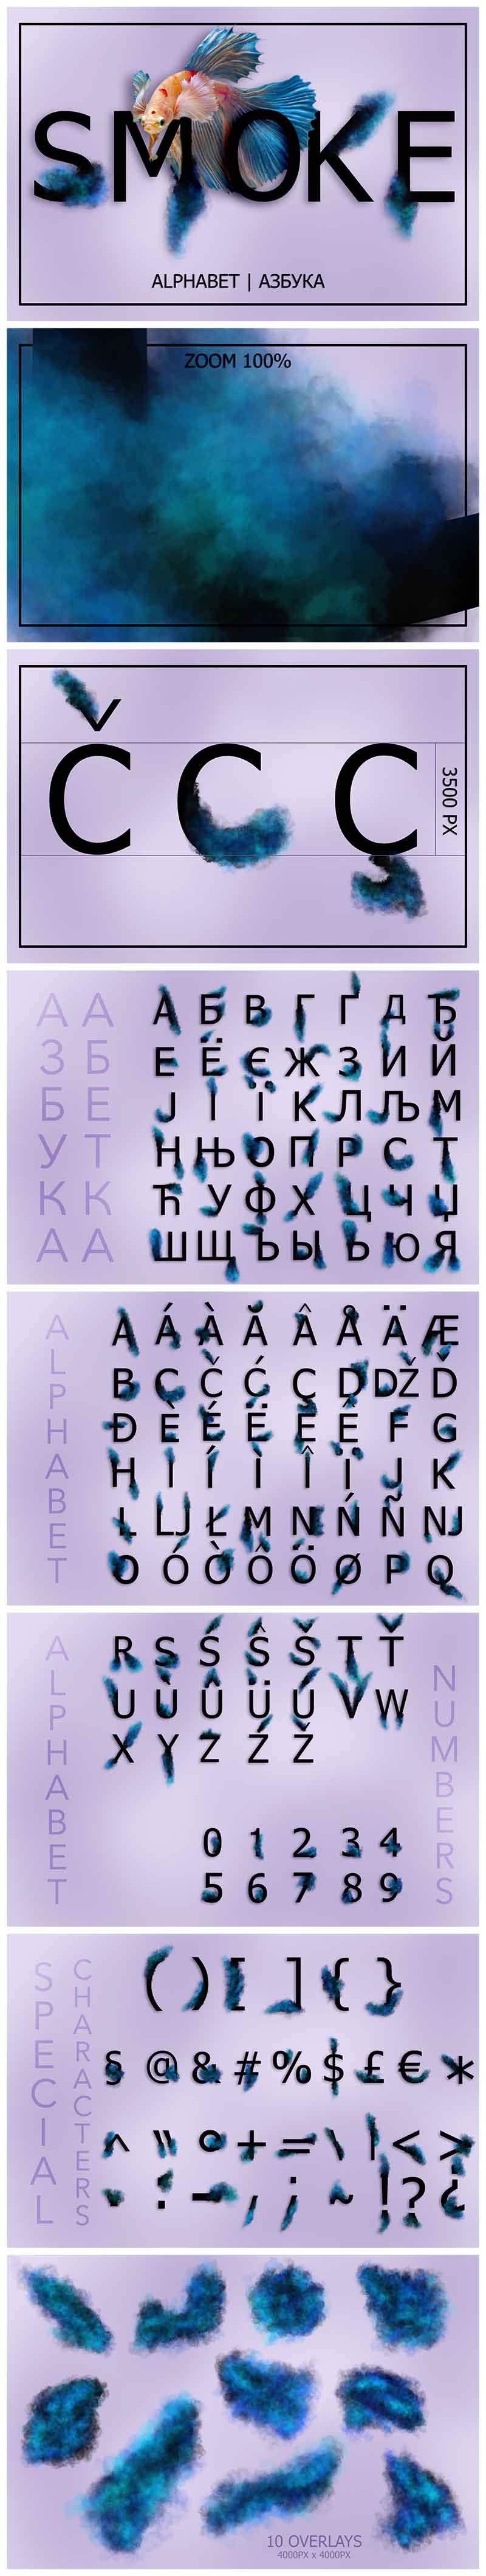 Huge Graphic Bundle Alphabet with 1000+ elements - $25 - BlueSmoke min